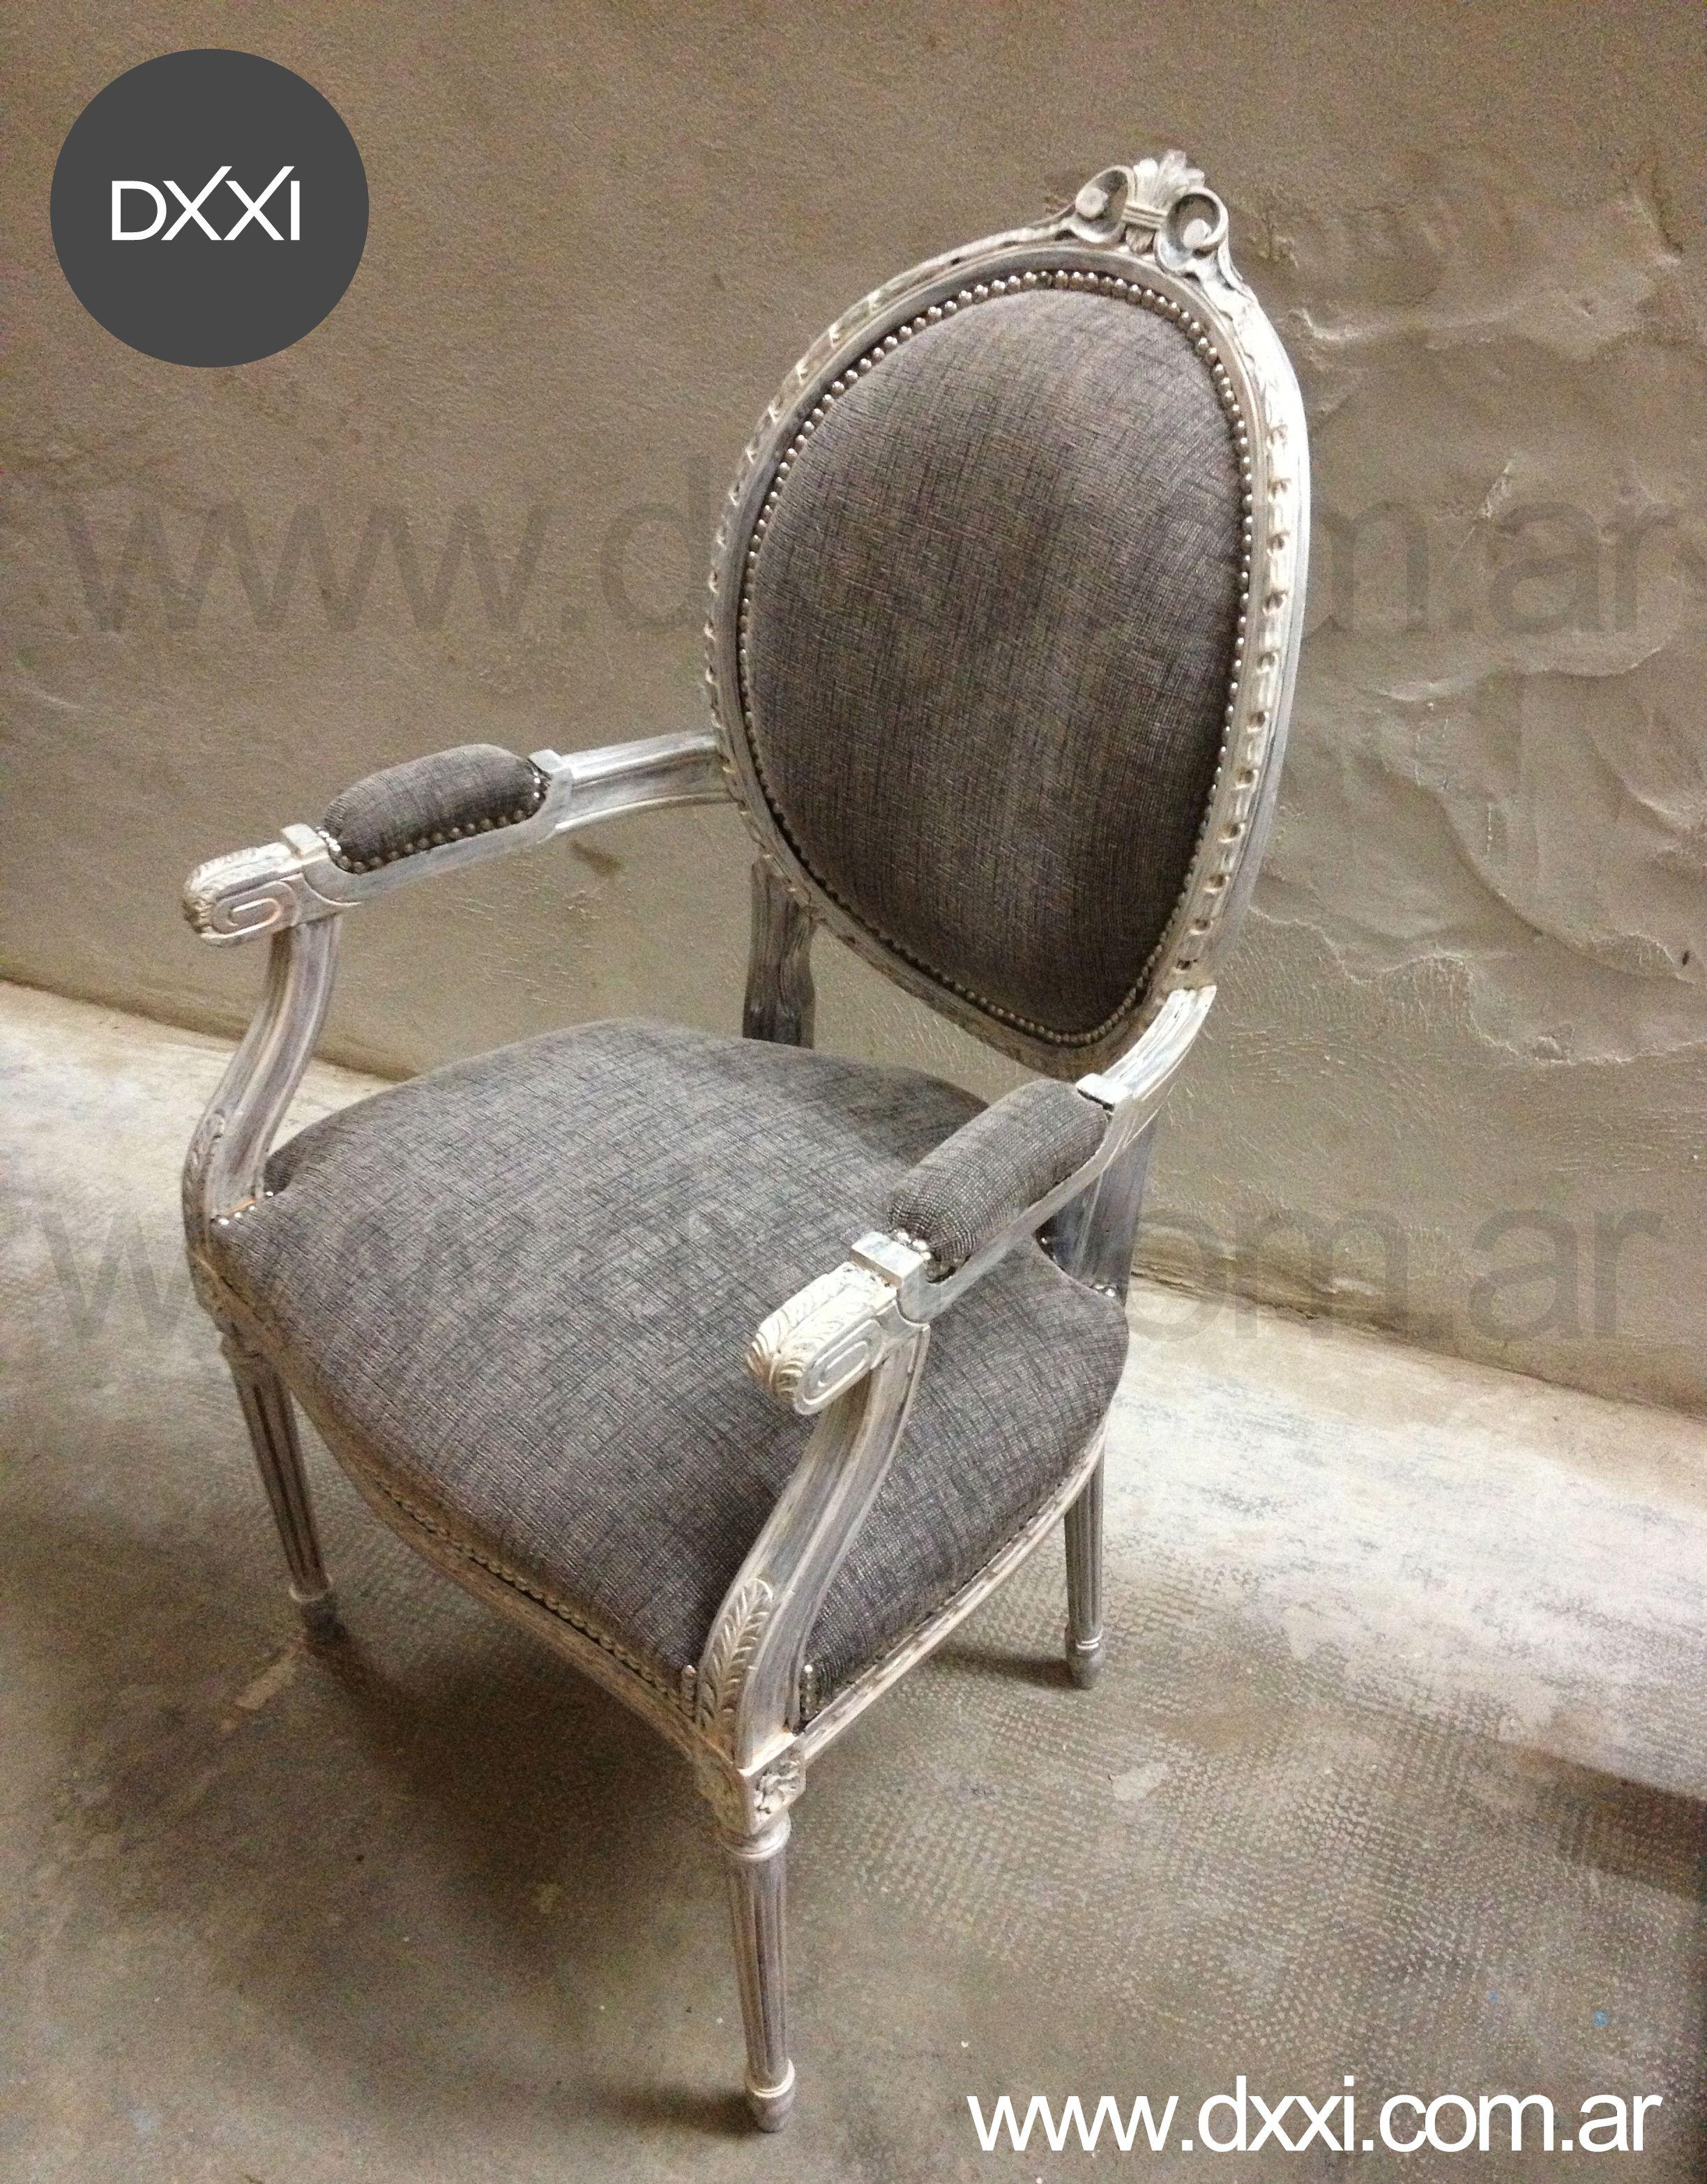 Restauracion silla luis xvi dxxi luisxvi chair muebles furniture estilo - Sillas estilo luis xvi ...